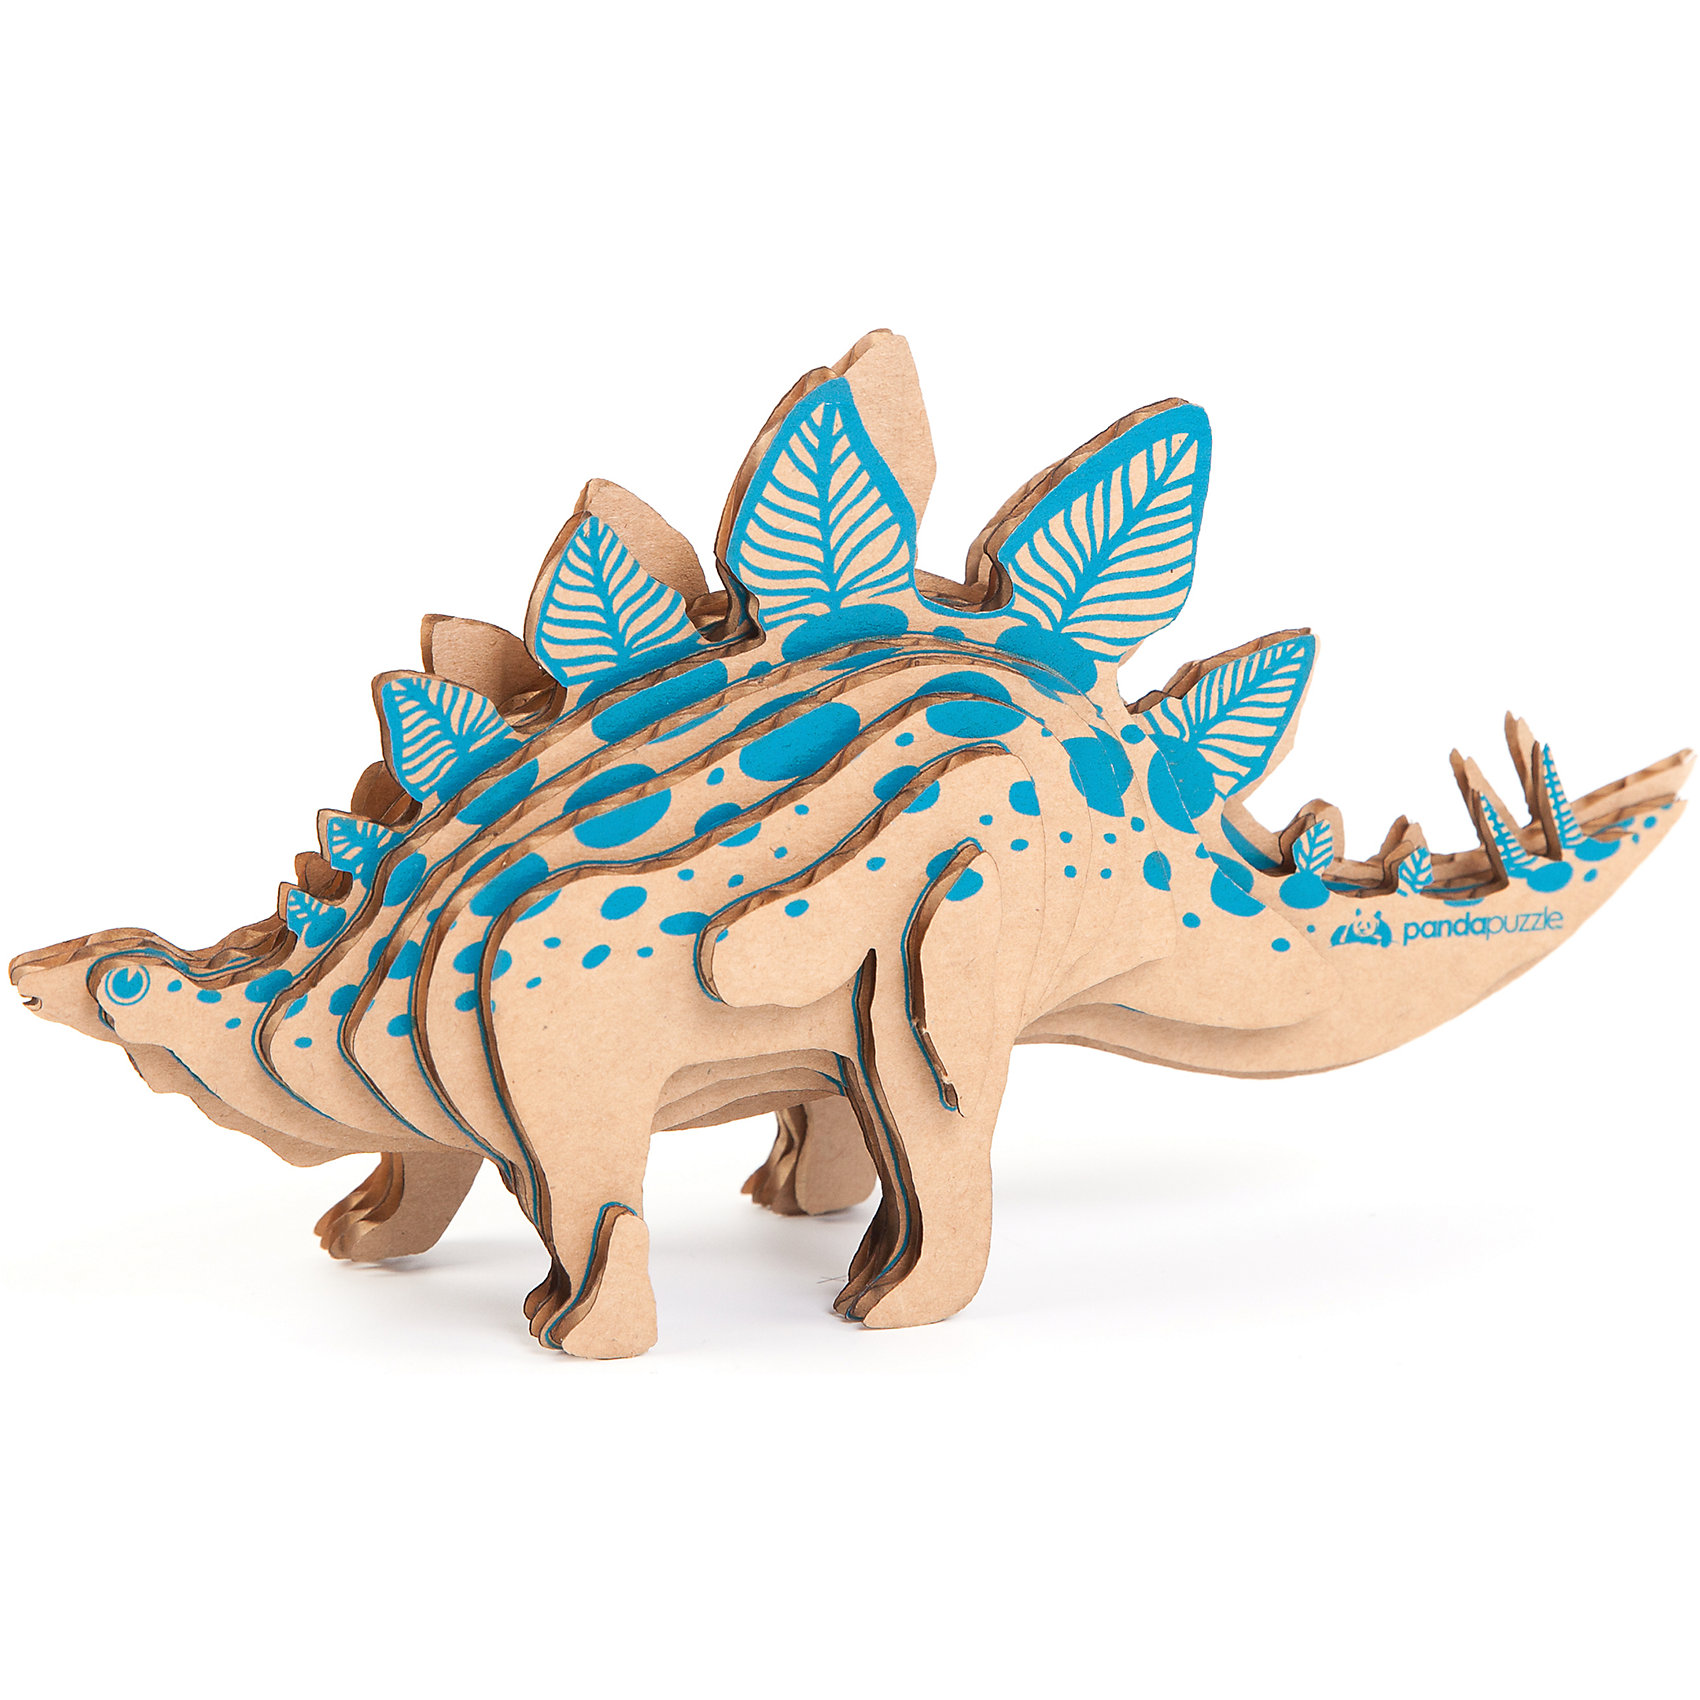 - 3D-Пазл «Стегозавр», PandaPuzzle пазлы magic pazle объемный 3d пазл эйфелева башня 78x38x35 см